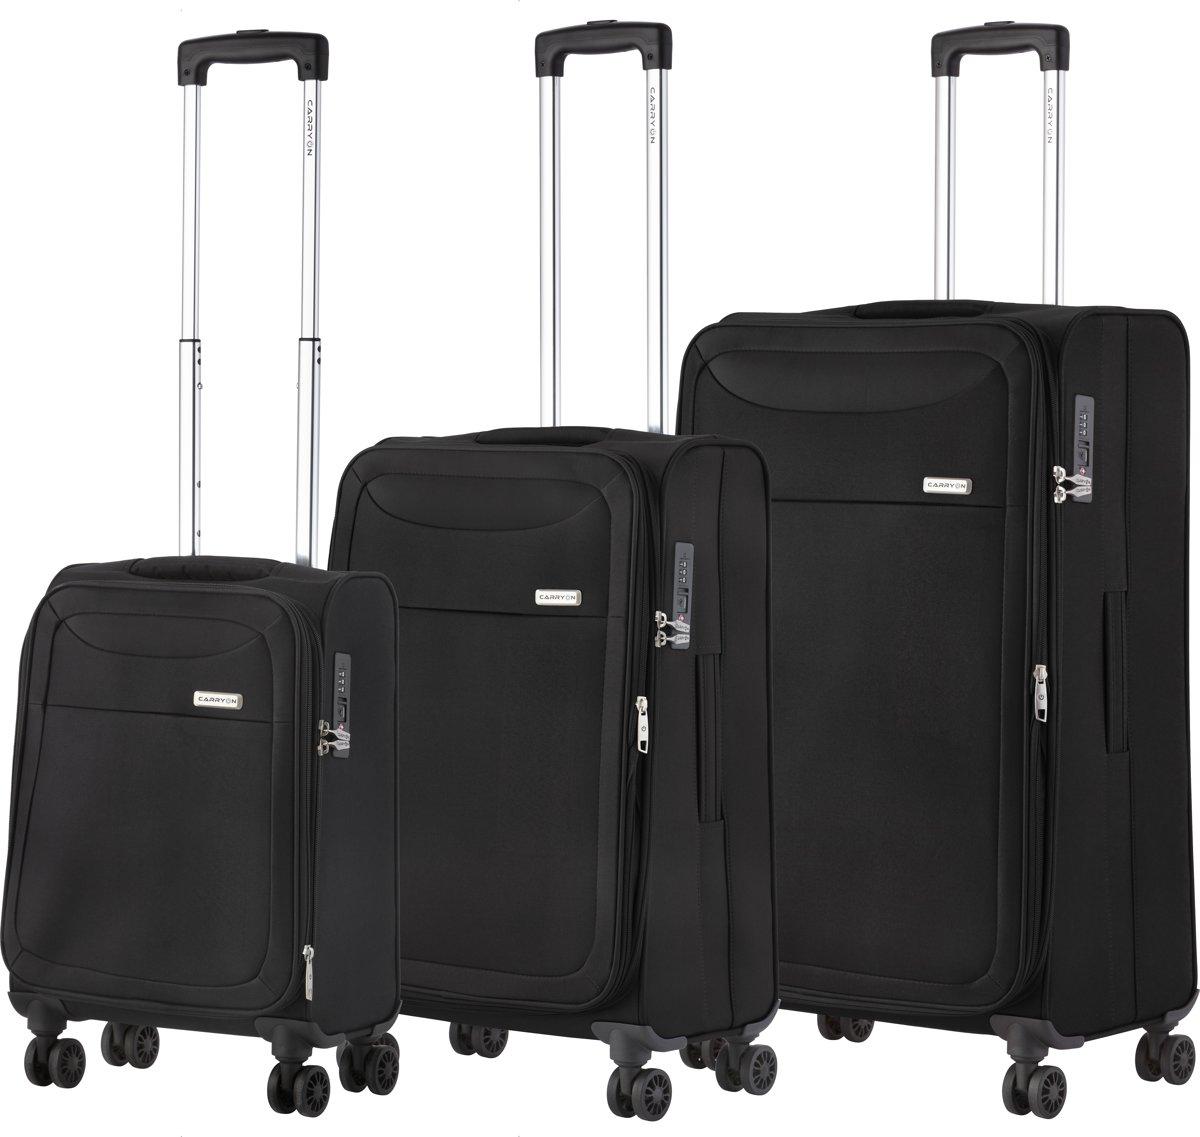 CarryOn Air - Kofferset met wielen - 3 delige trolleyset met TSA-cijferslot - 5 jaar garantie en anti-diefstal rits - Zwart kopen